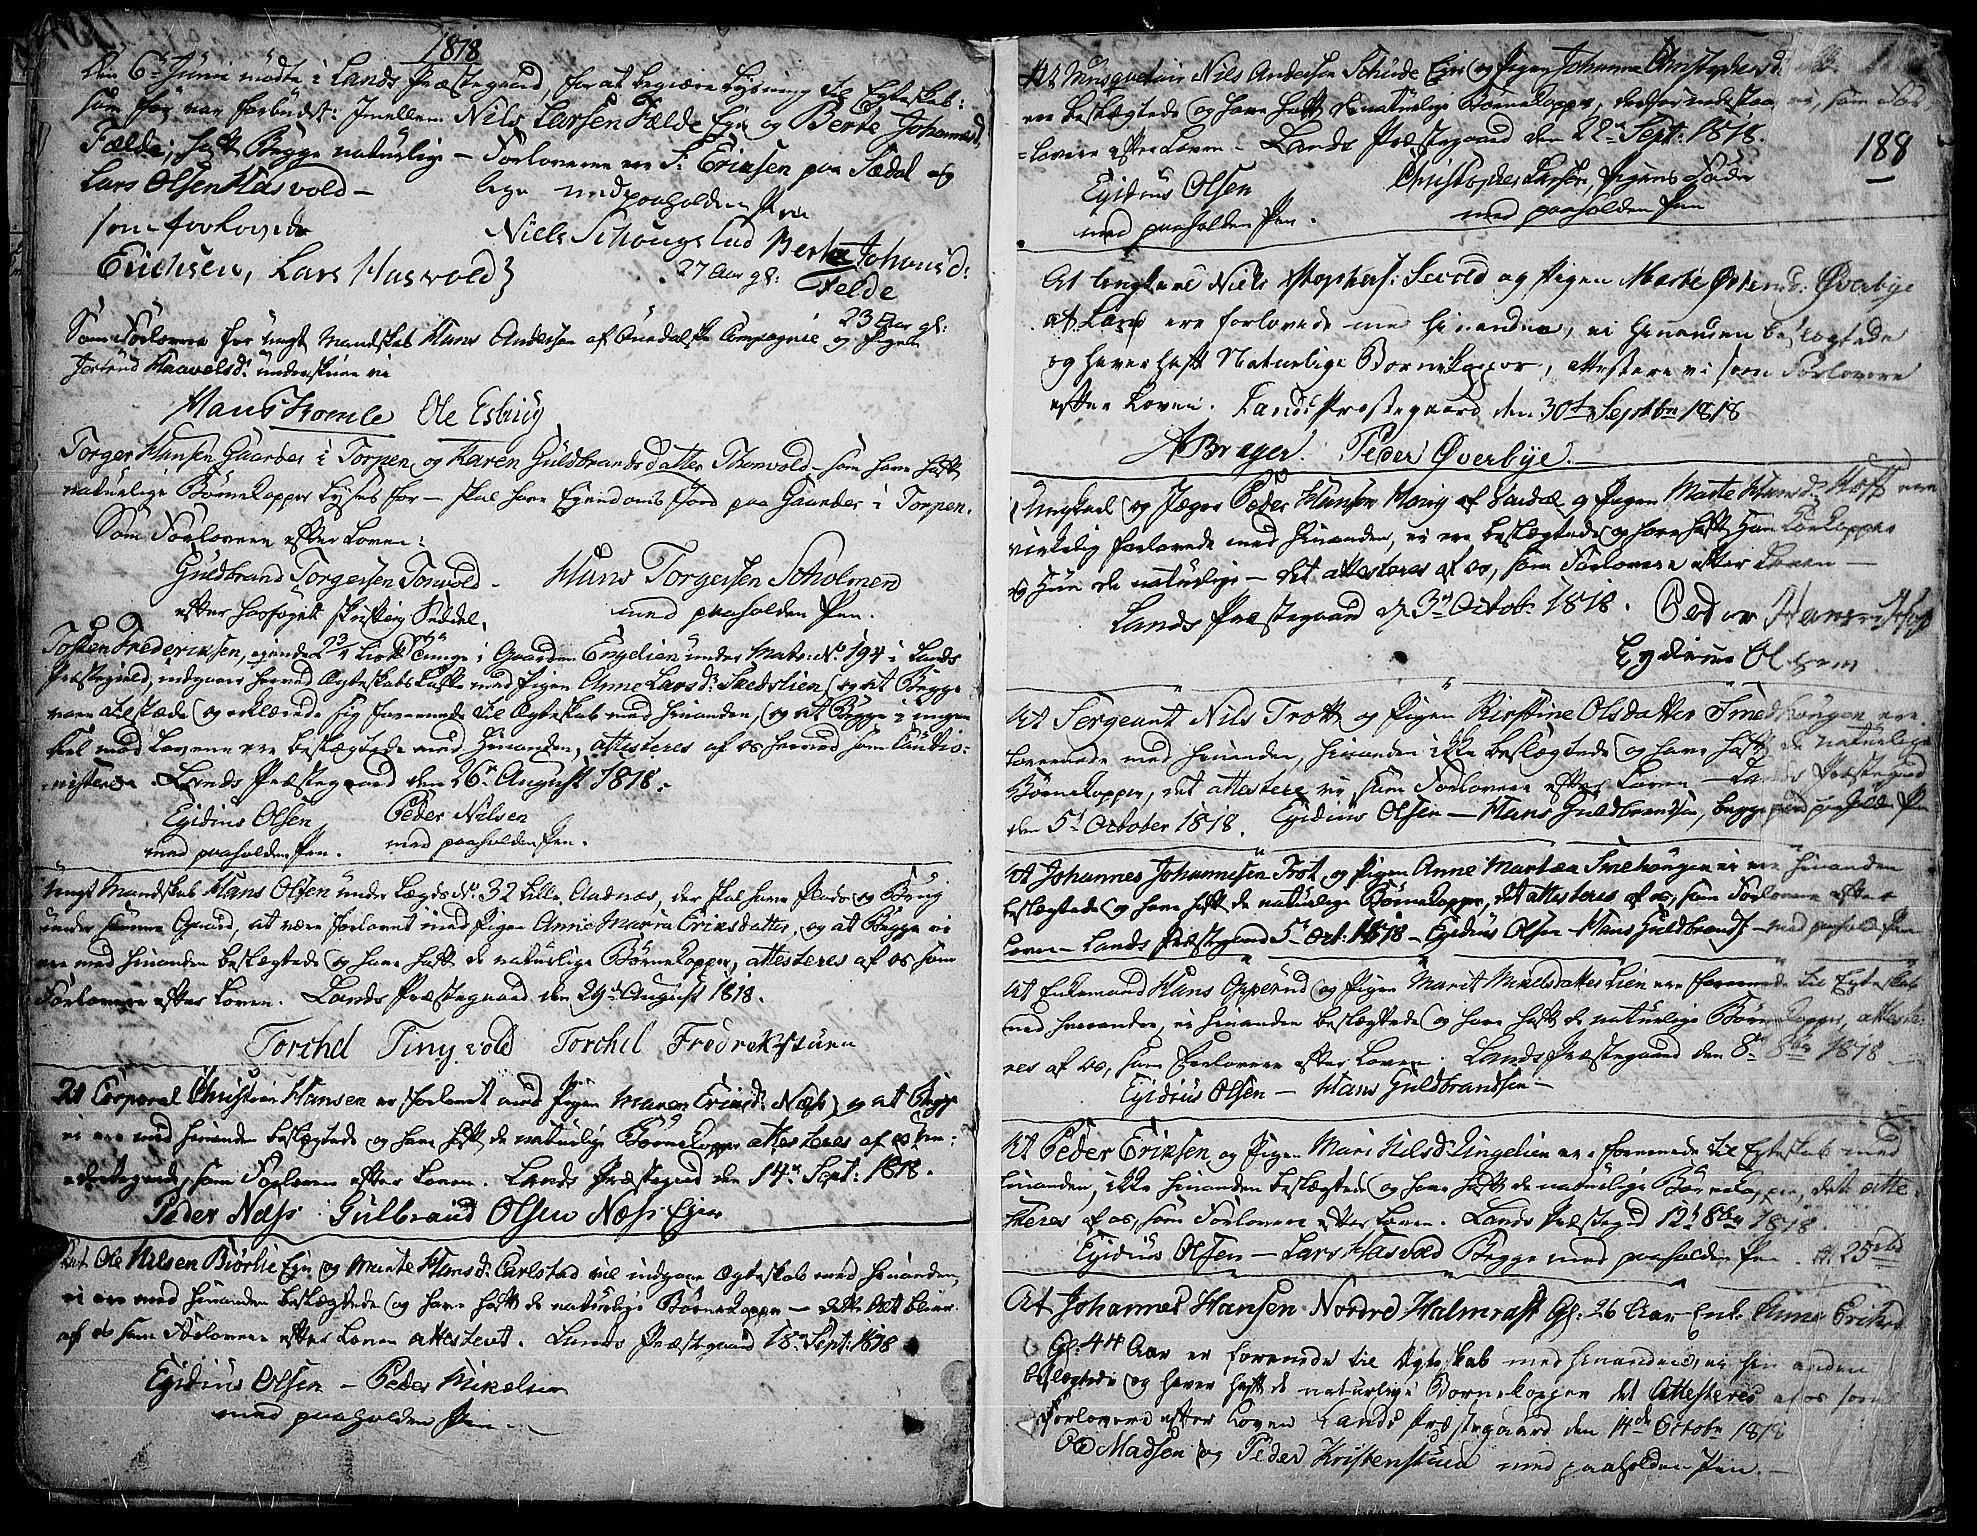 SAH, Land prestekontor, Ministerialbok nr. 6, 1784-1813, s. 188